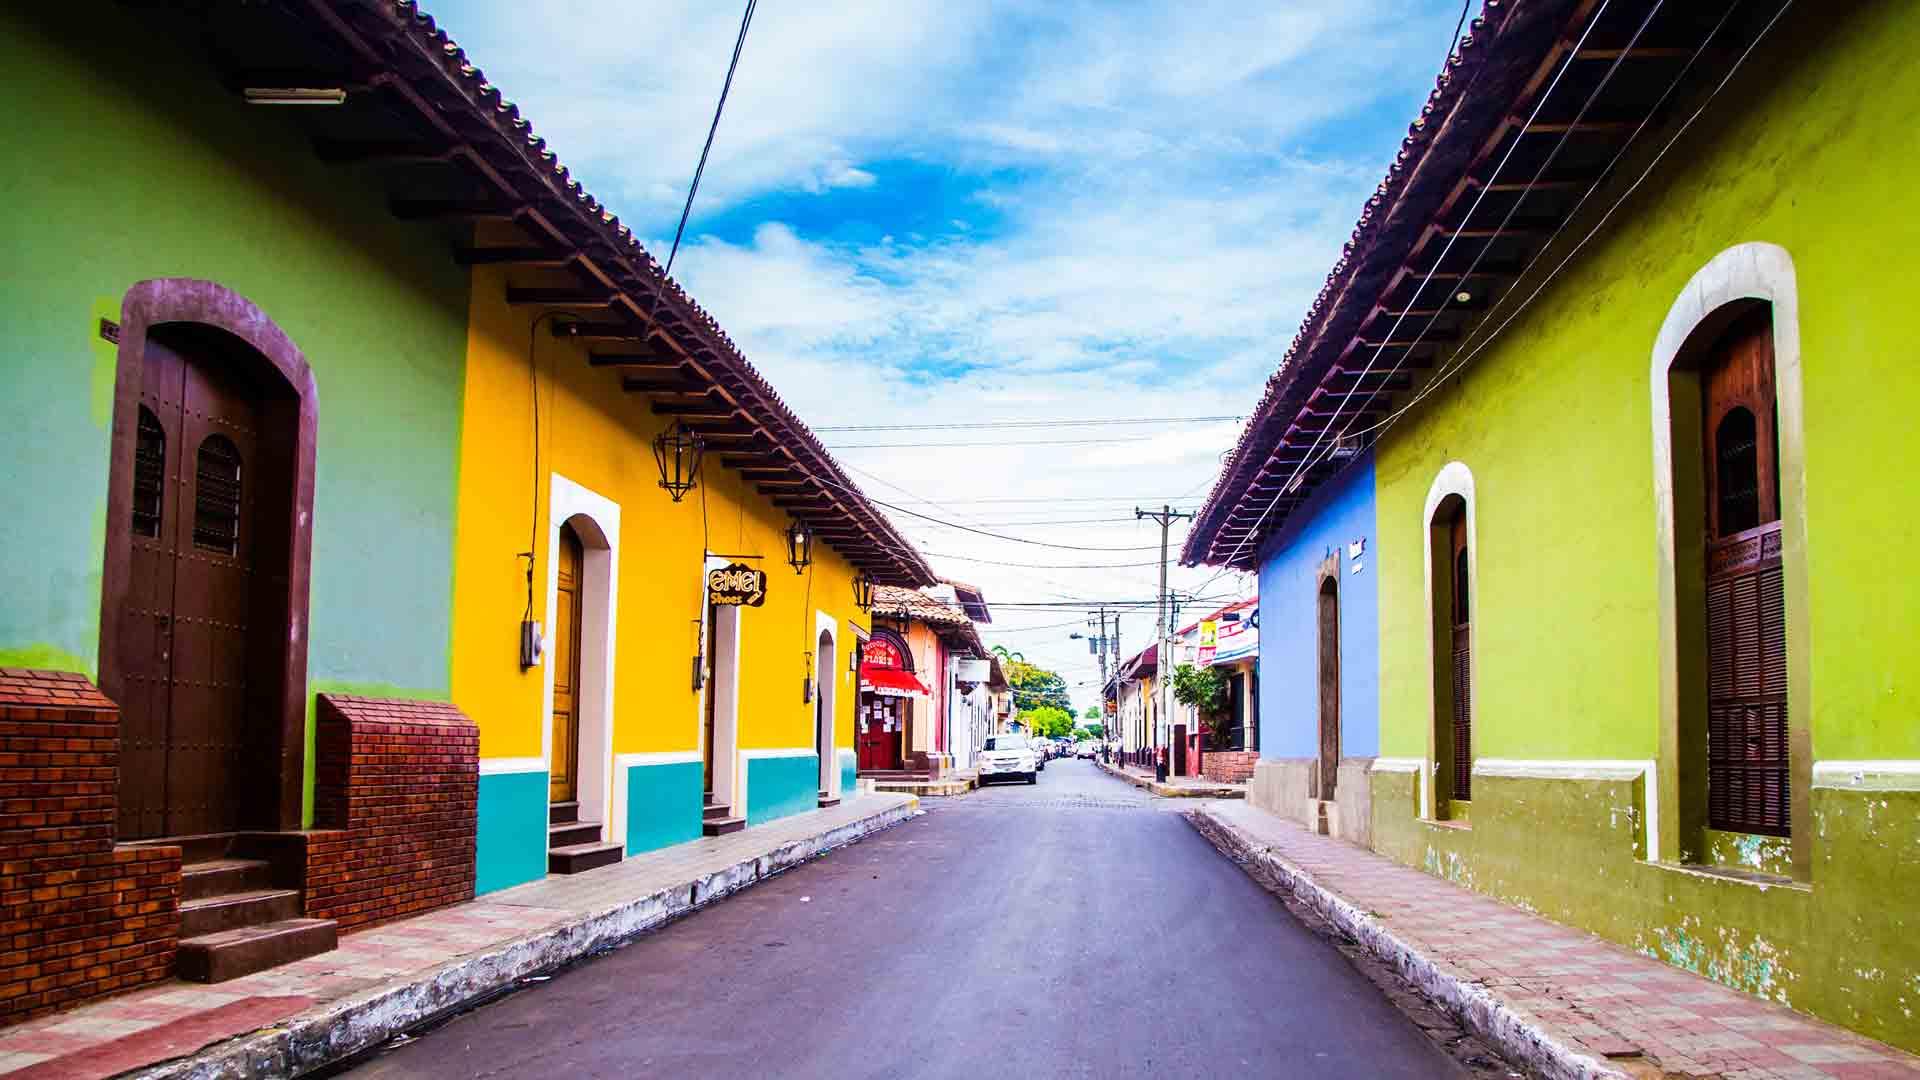 Leon Department, na Nicarágua